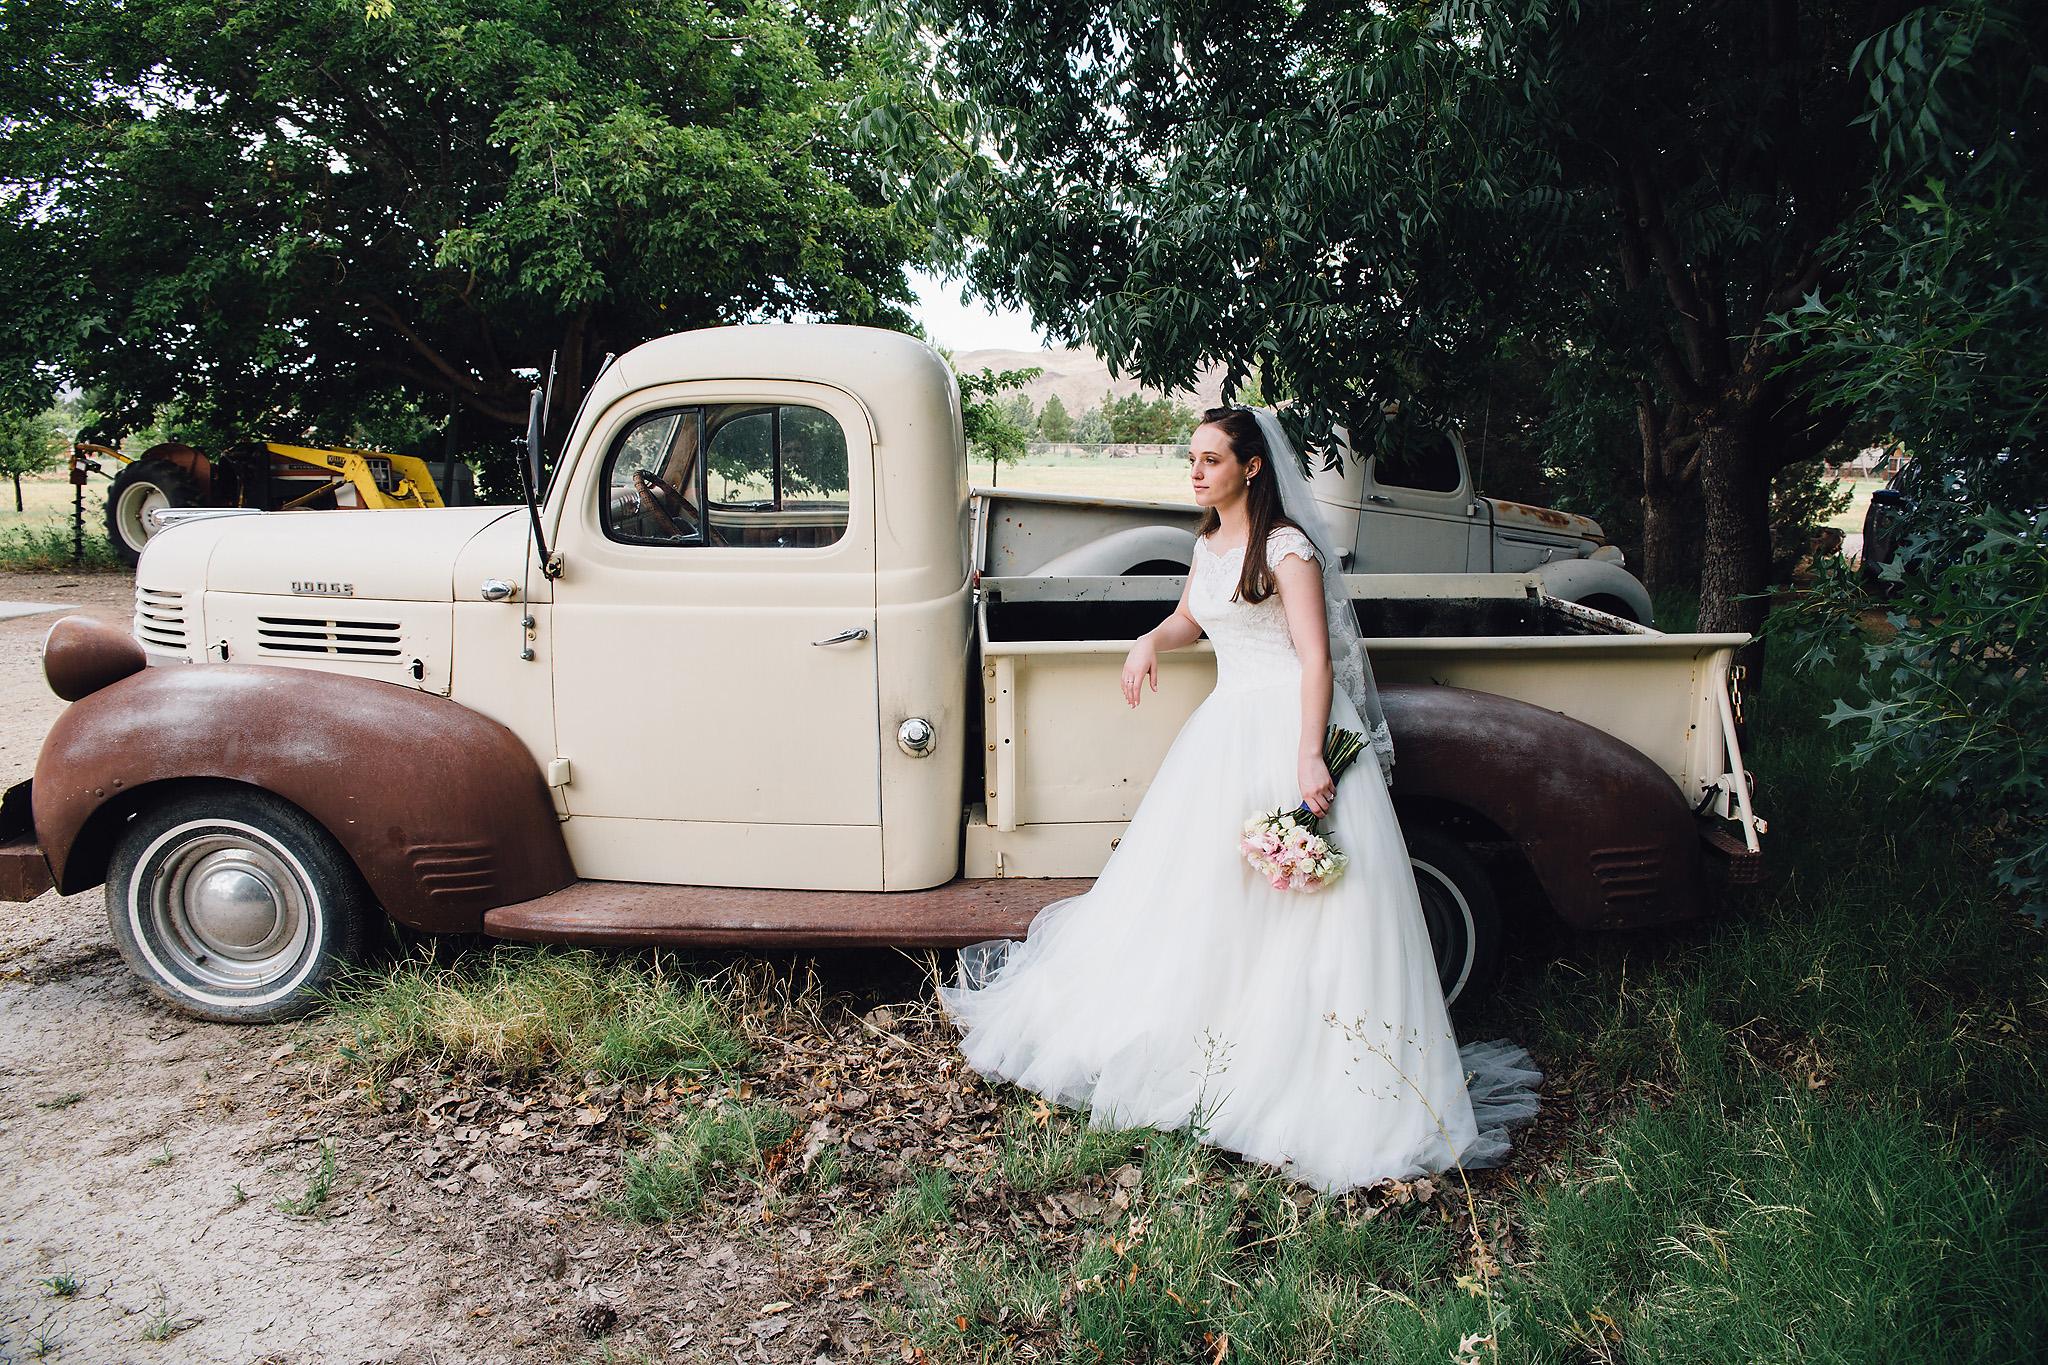 las-cruces-wedding-photographer-5.jpg